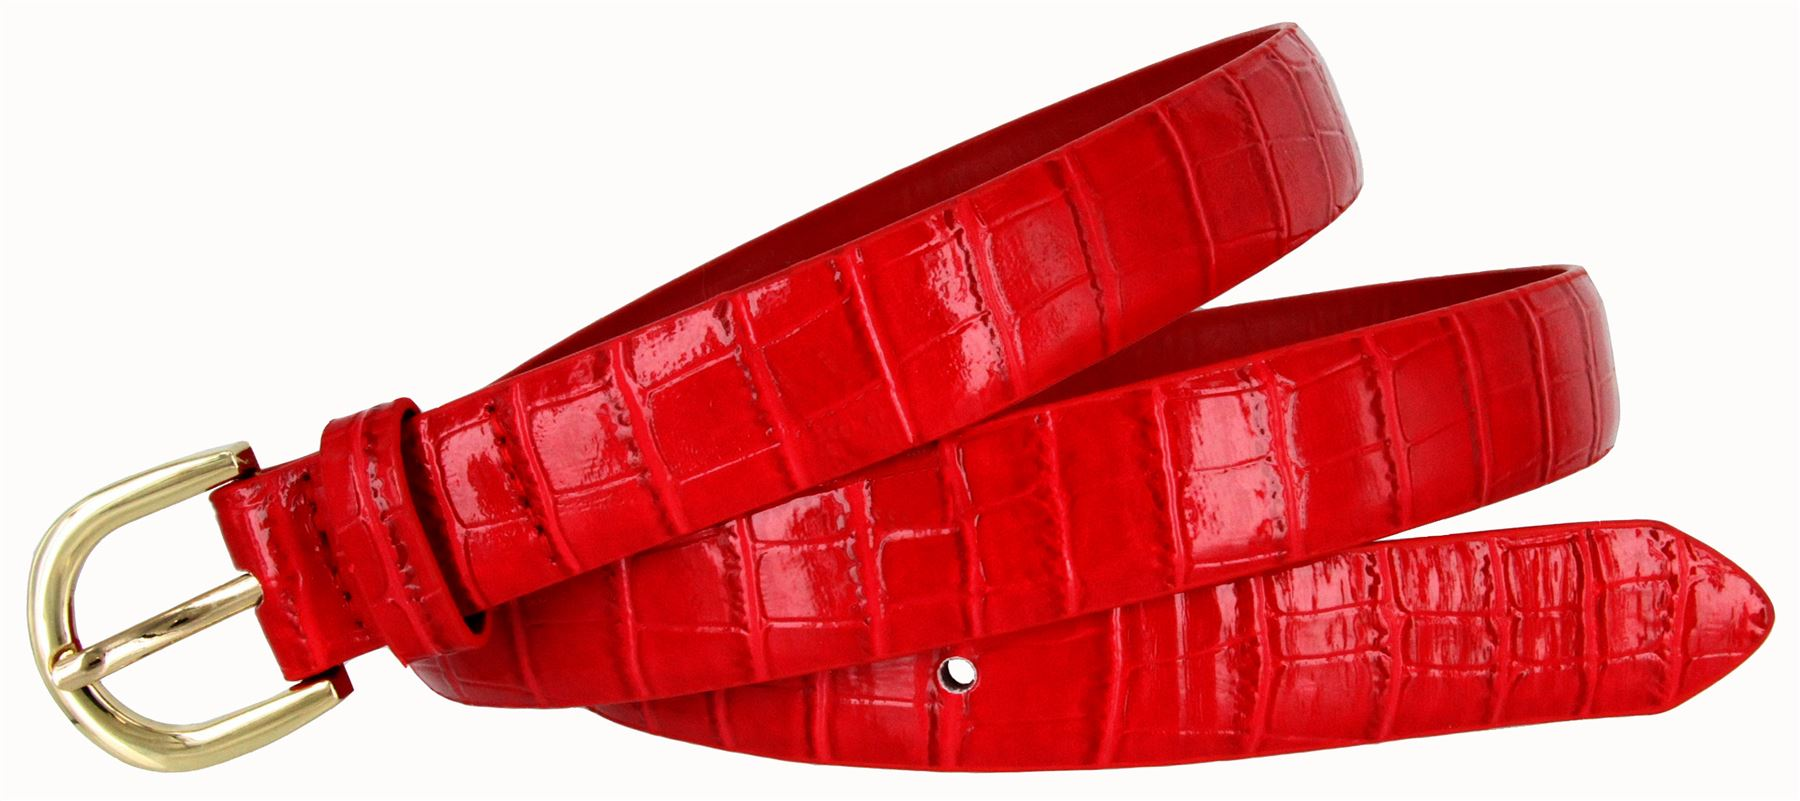 Women-039-s-Skinny-Thin-Alligator-Embossed-Genuine-Leather-Belt-1-034-25mm-Wide thumbnail 18